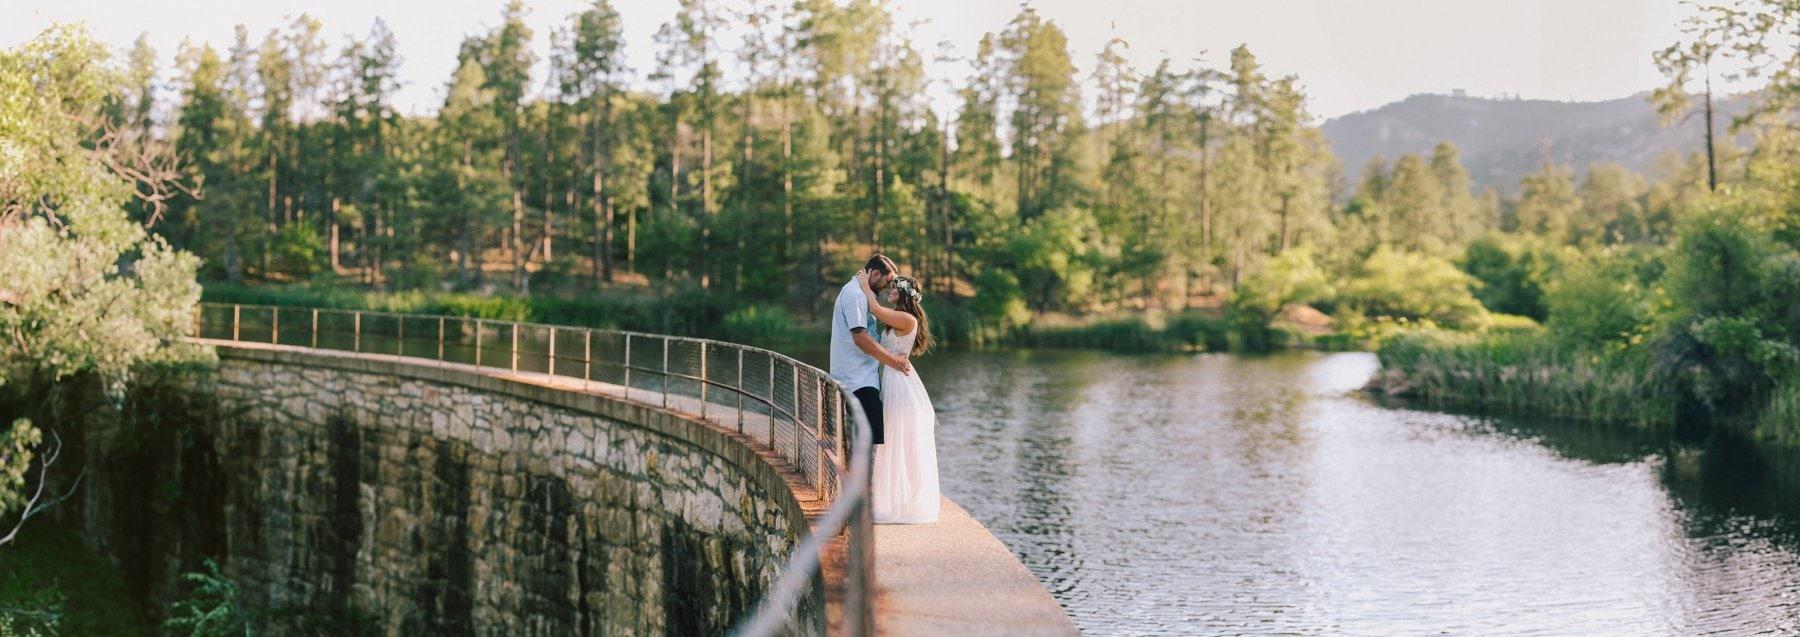 adventure elopement in northern Arizona lake